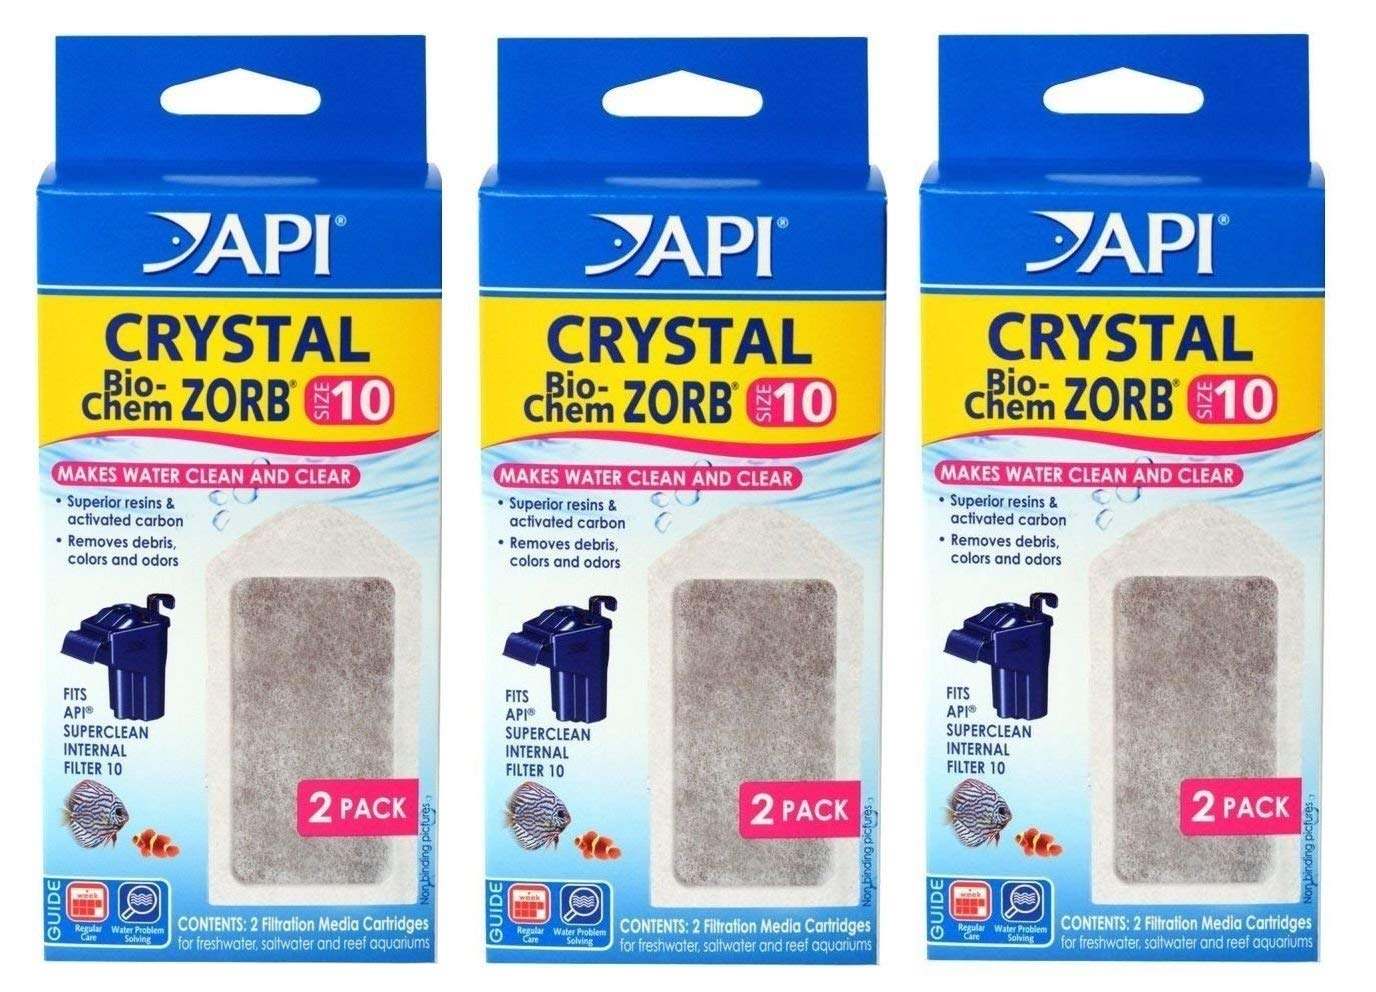 Filter Cartridge 6 API Crystal Bio-Chem Zorb Size 10 Internal Filter Cartridge 6 Pk (3x2 Pack)